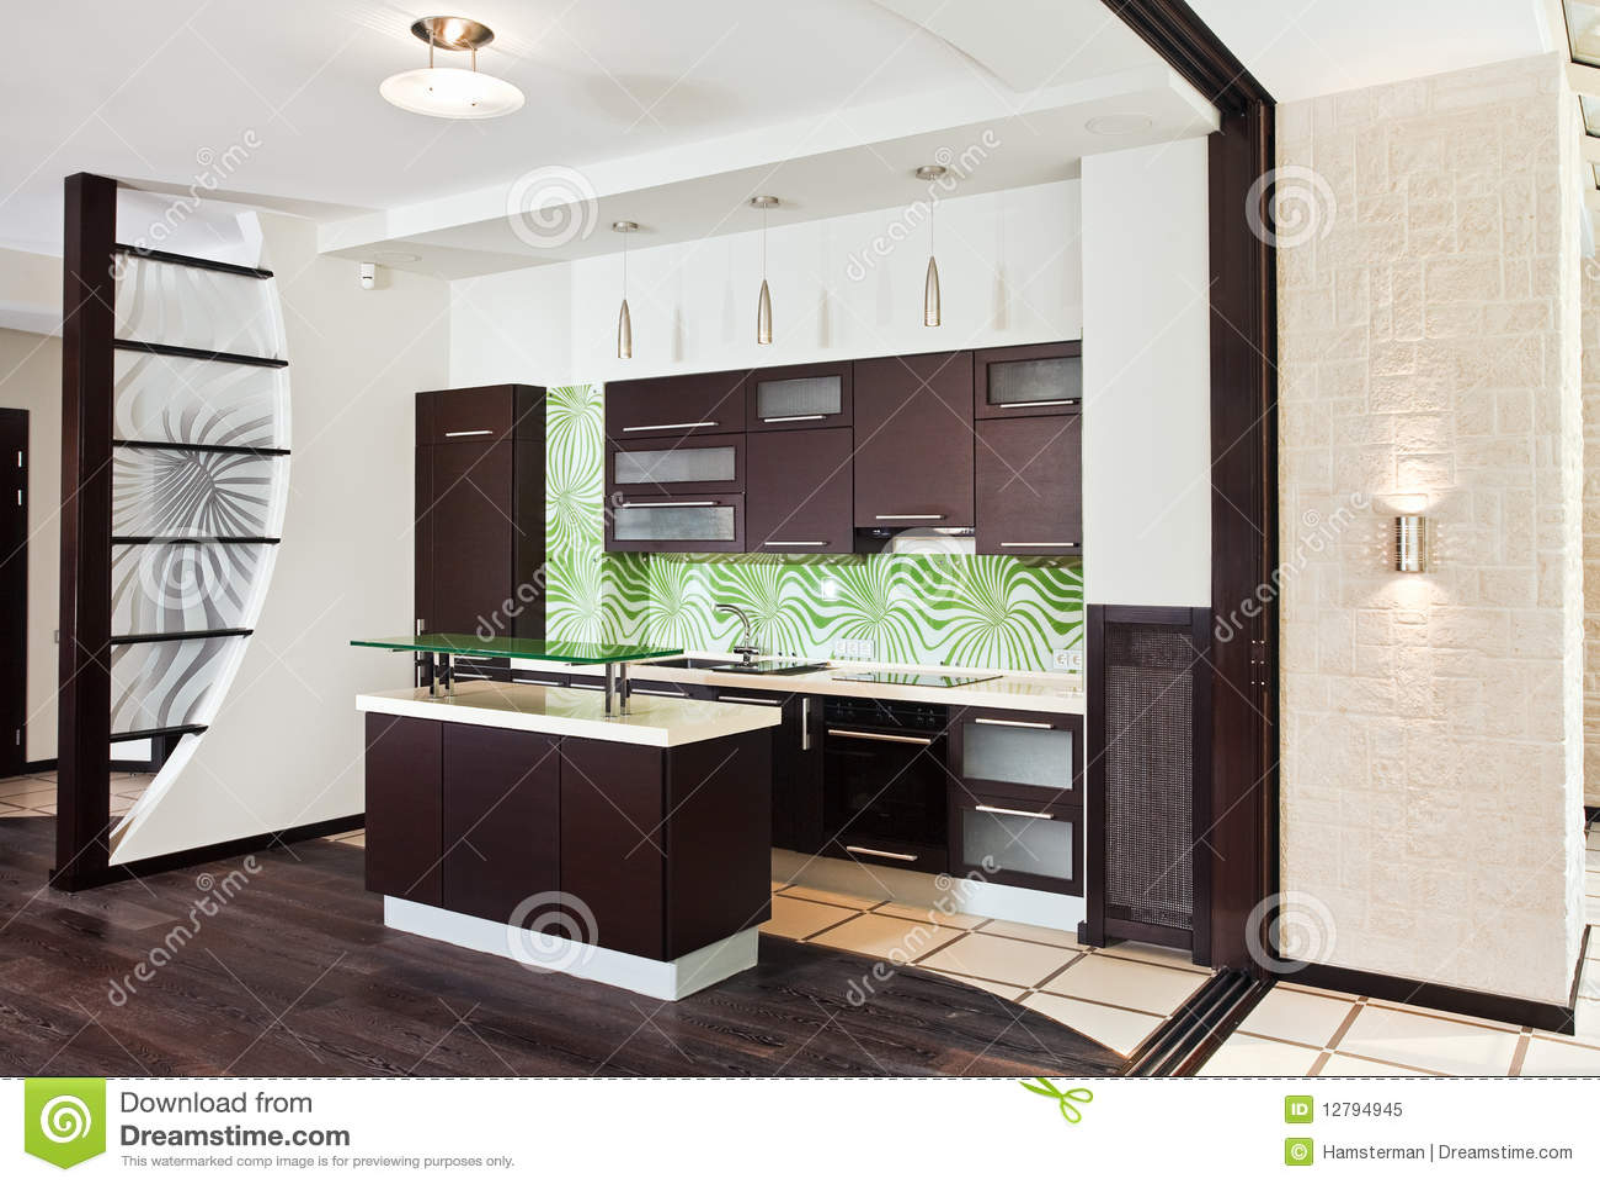 moderne k che mit dunklem h lzernem fu boden lizenzfreies stockfoto bild 12794945. Black Bedroom Furniture Sets. Home Design Ideas